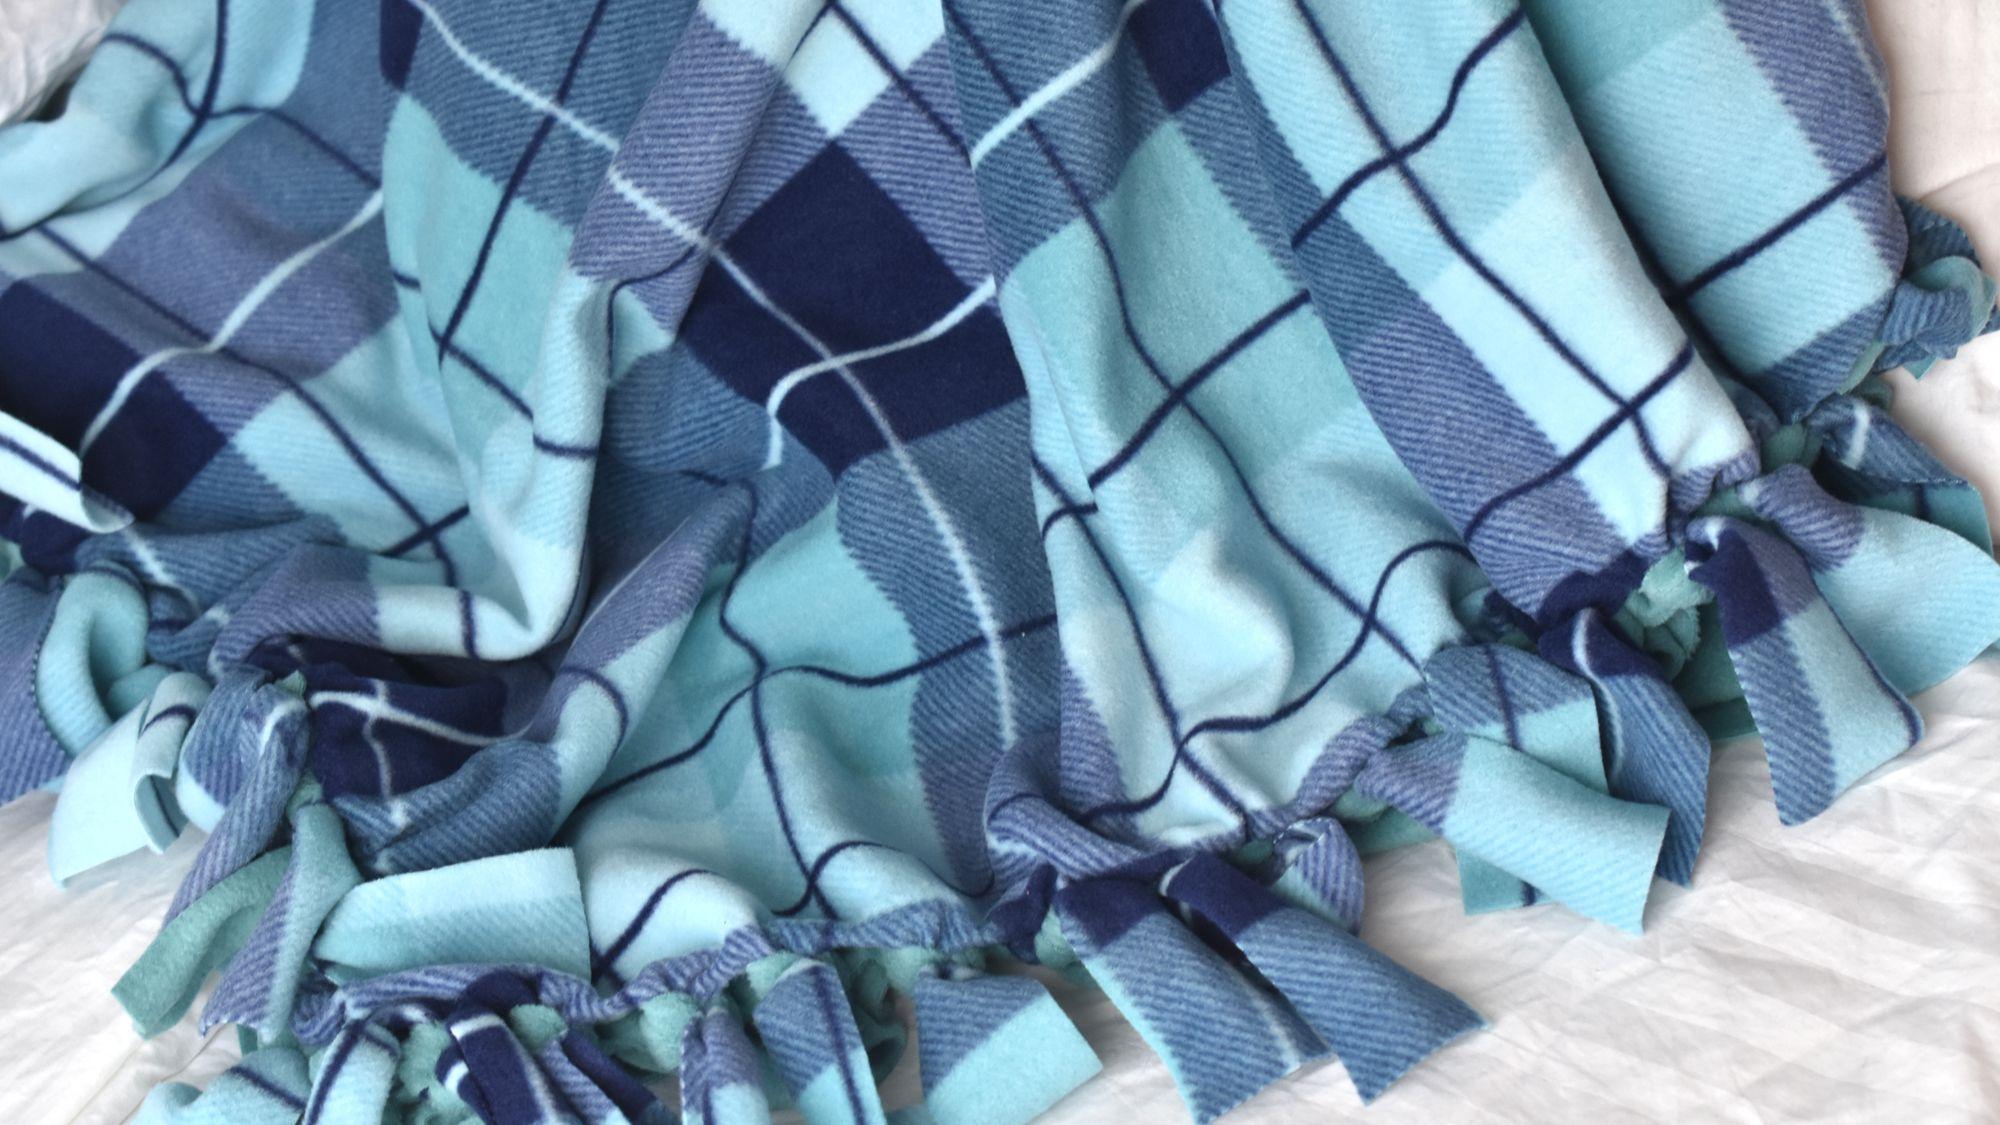 CHEVRON FLEECE BLANKET..No Sew..Hand Tied..Double Layer..Reversible..Fringe BlanketThrow..Gift